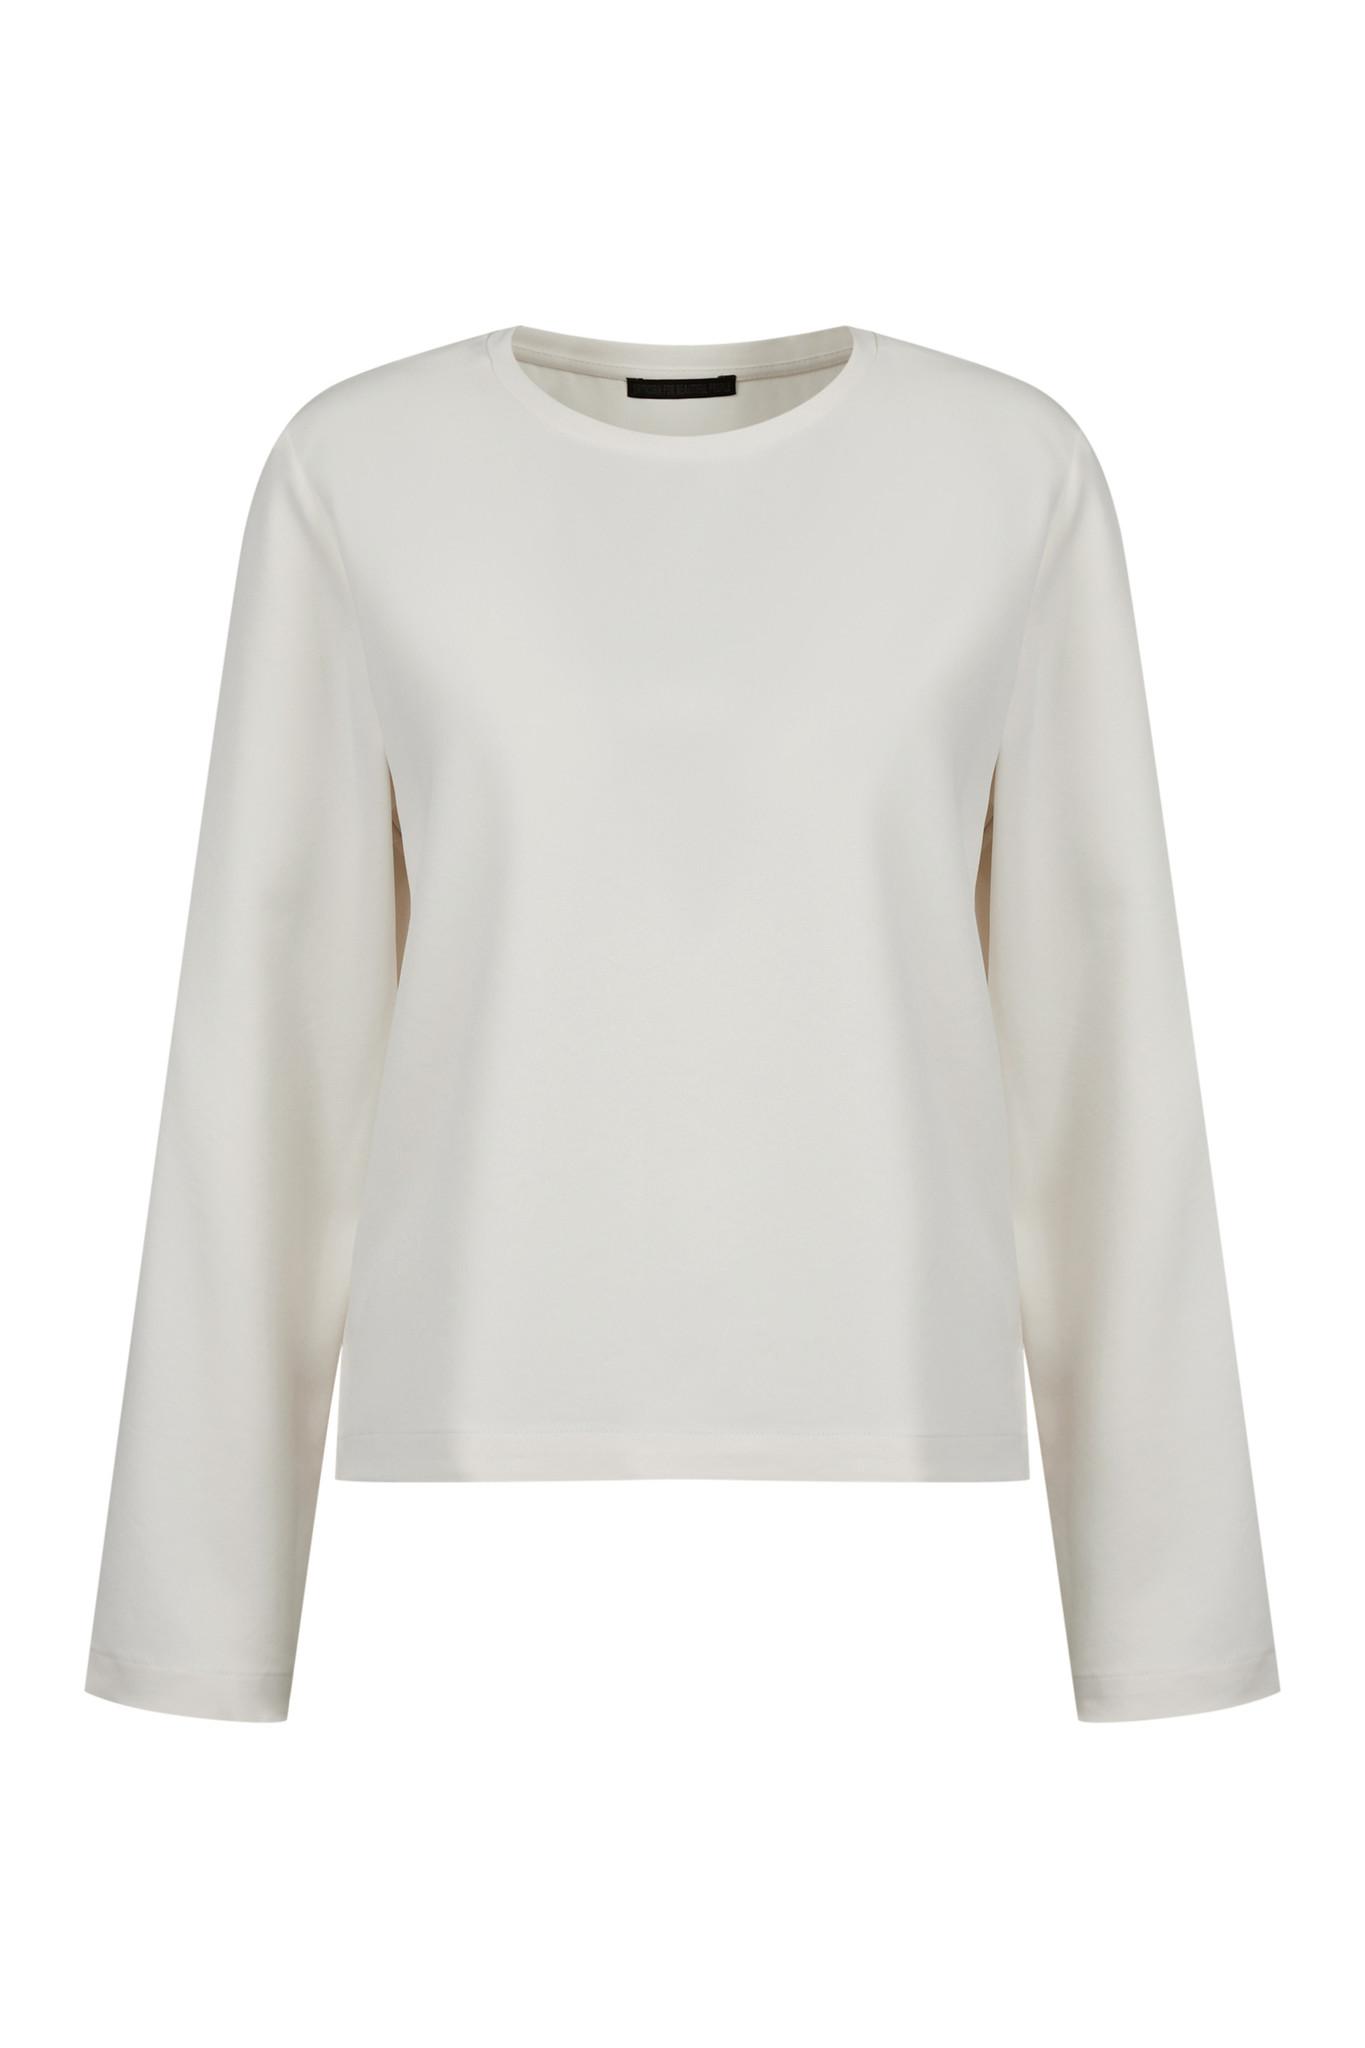 drykorn pullover DELANIA 130014-1